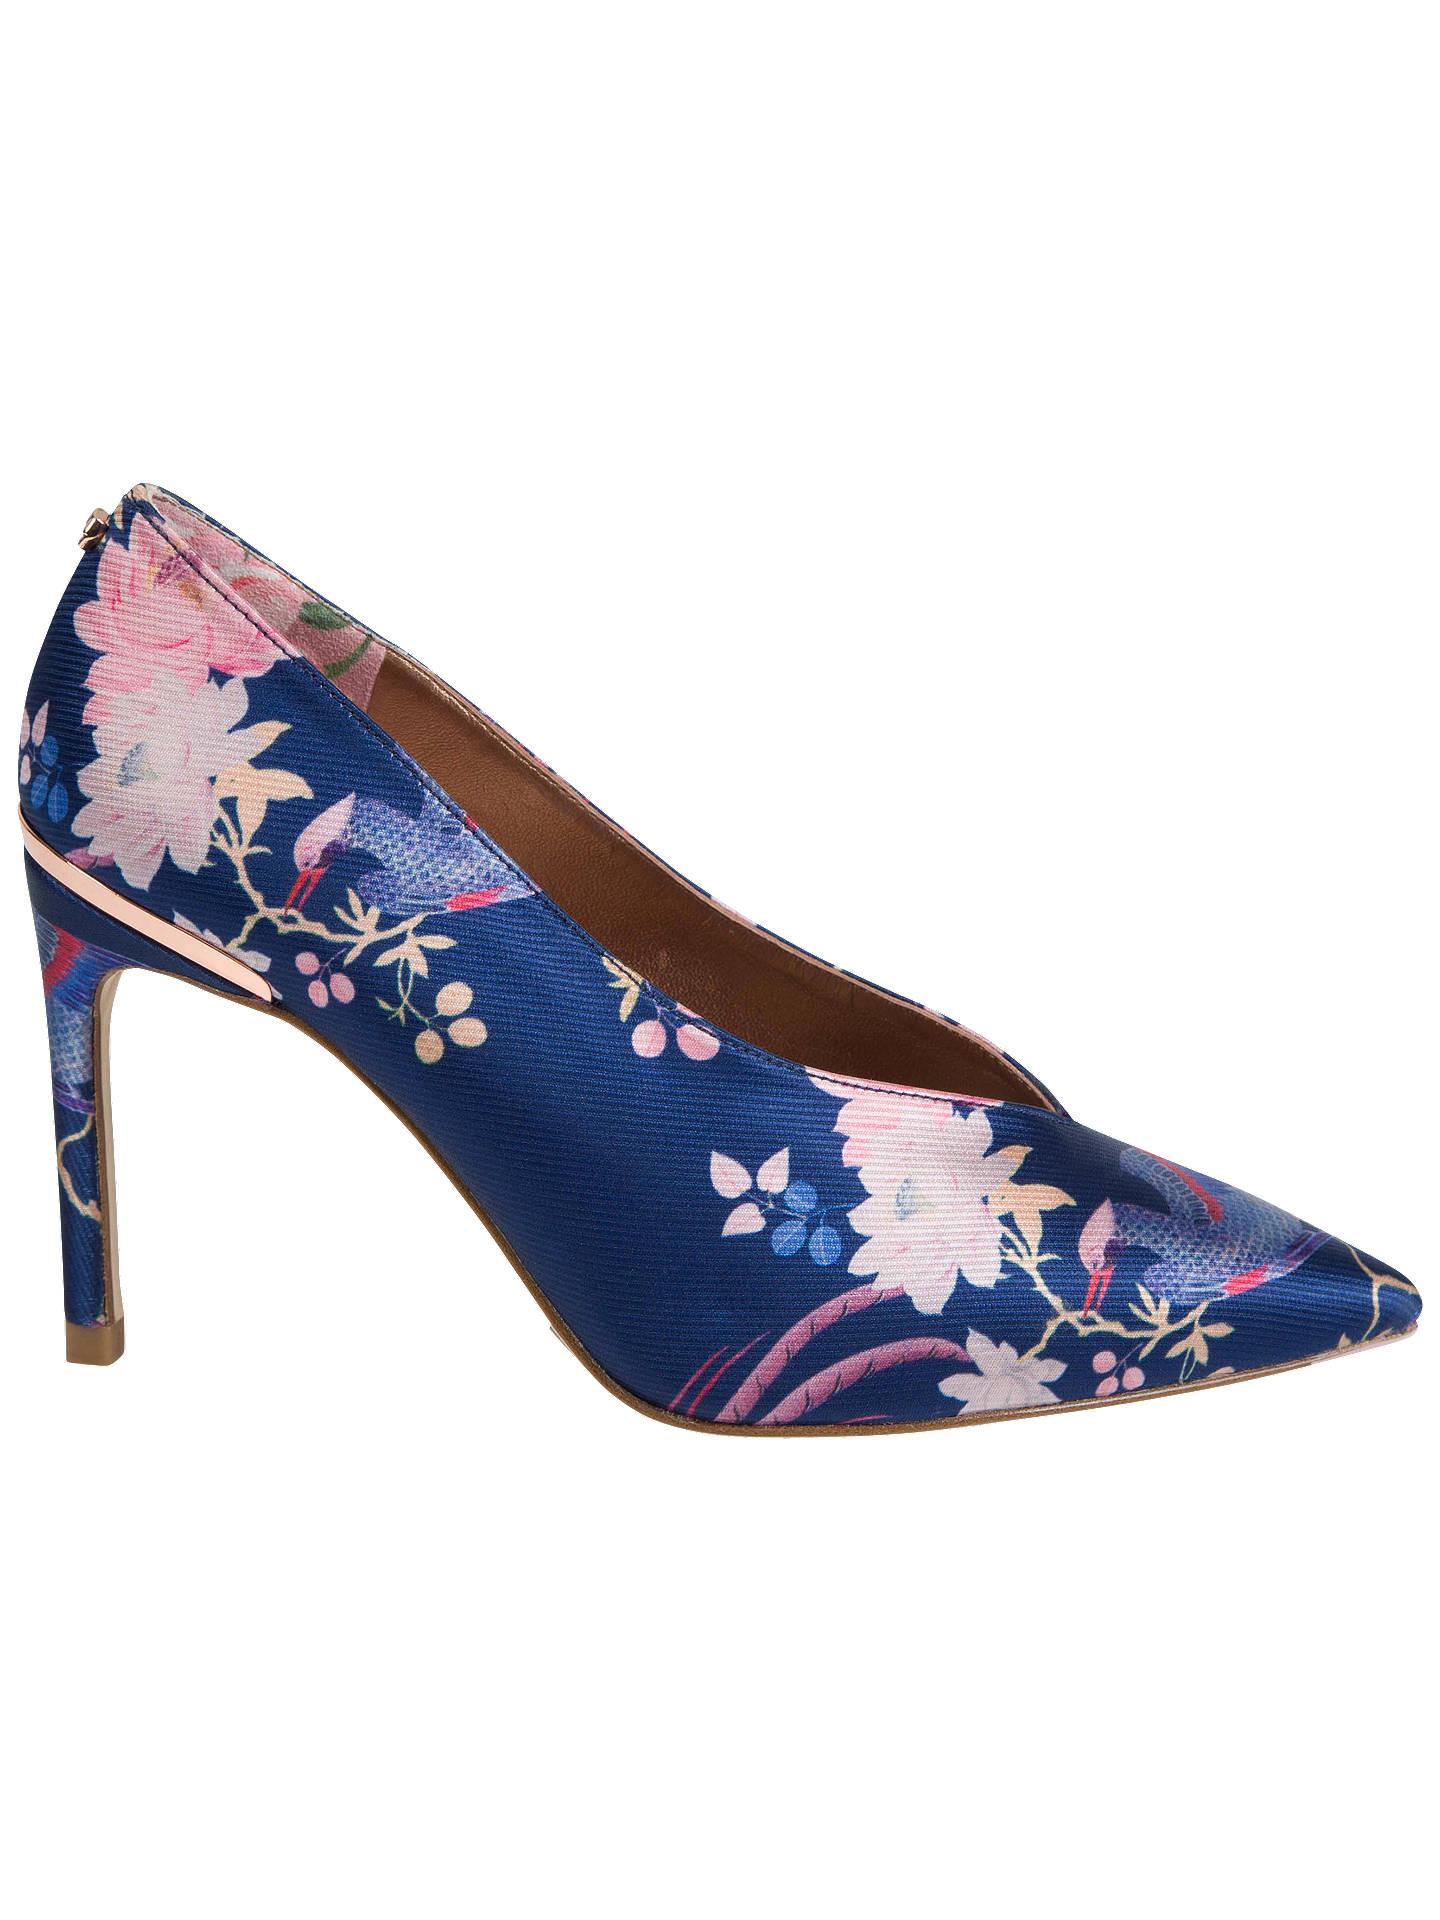 f6c72139d2ea6 Buy Ted Baker Jazimn Jacquard Court Shoes